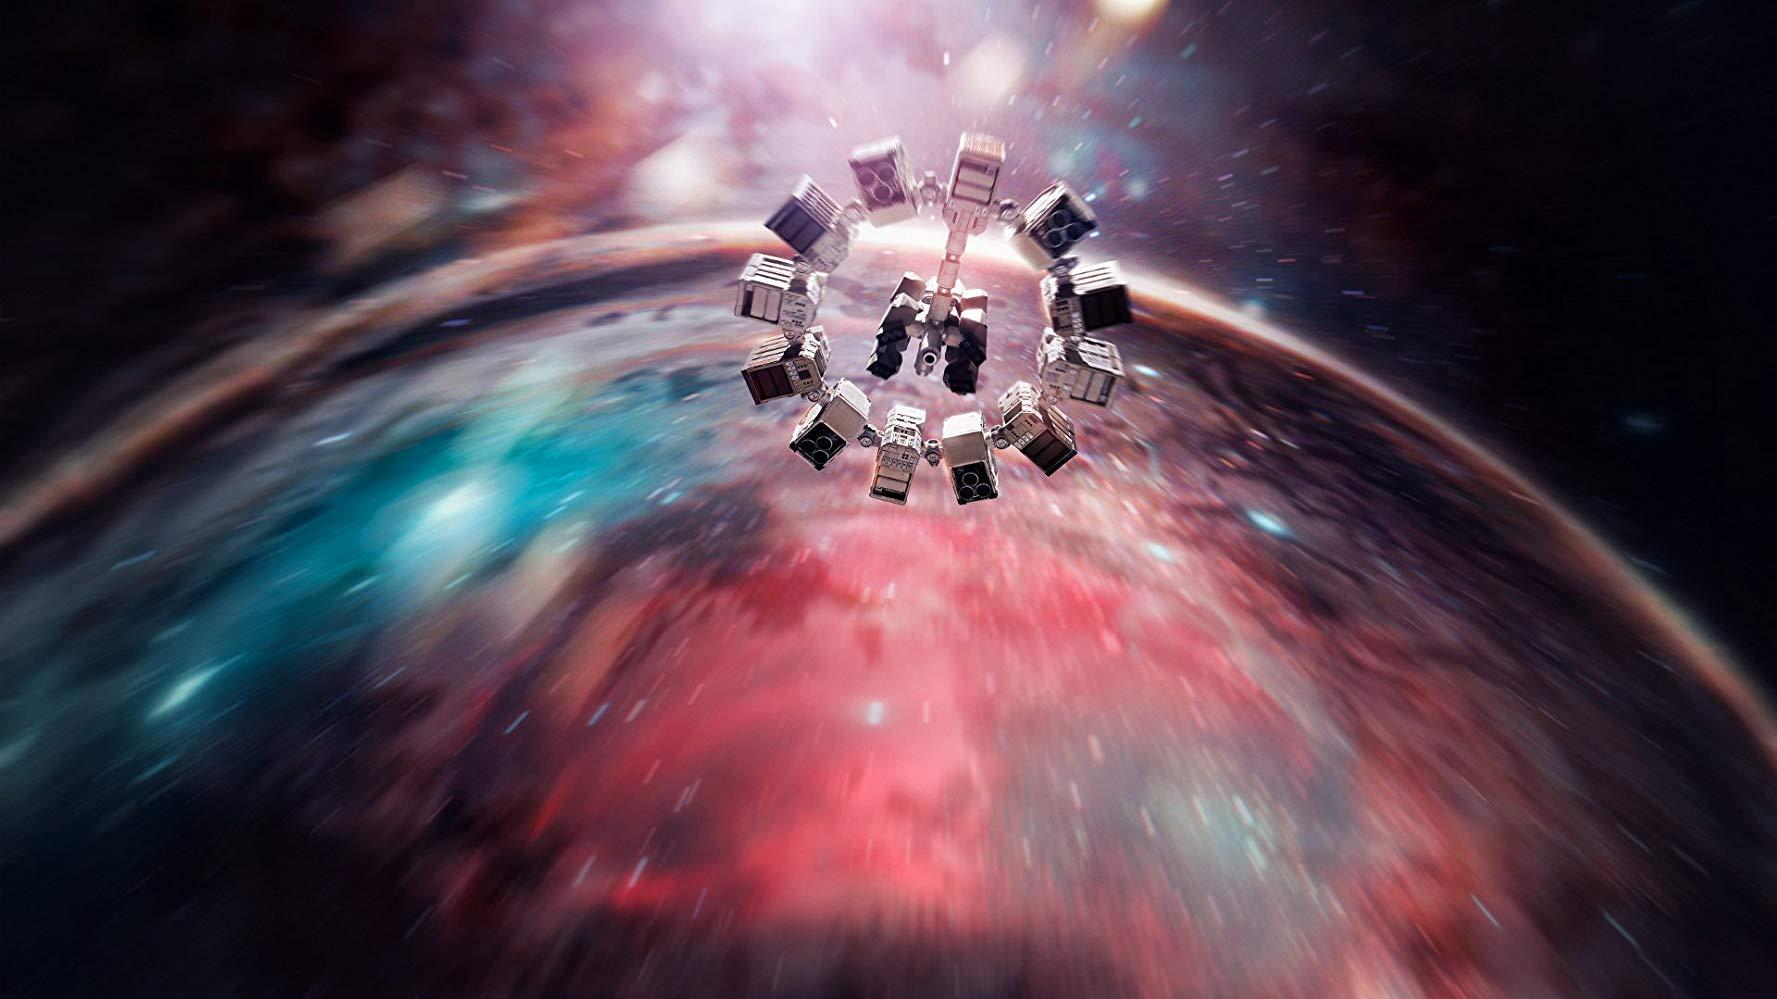 The Endurance in flight in Interstellar (2014)